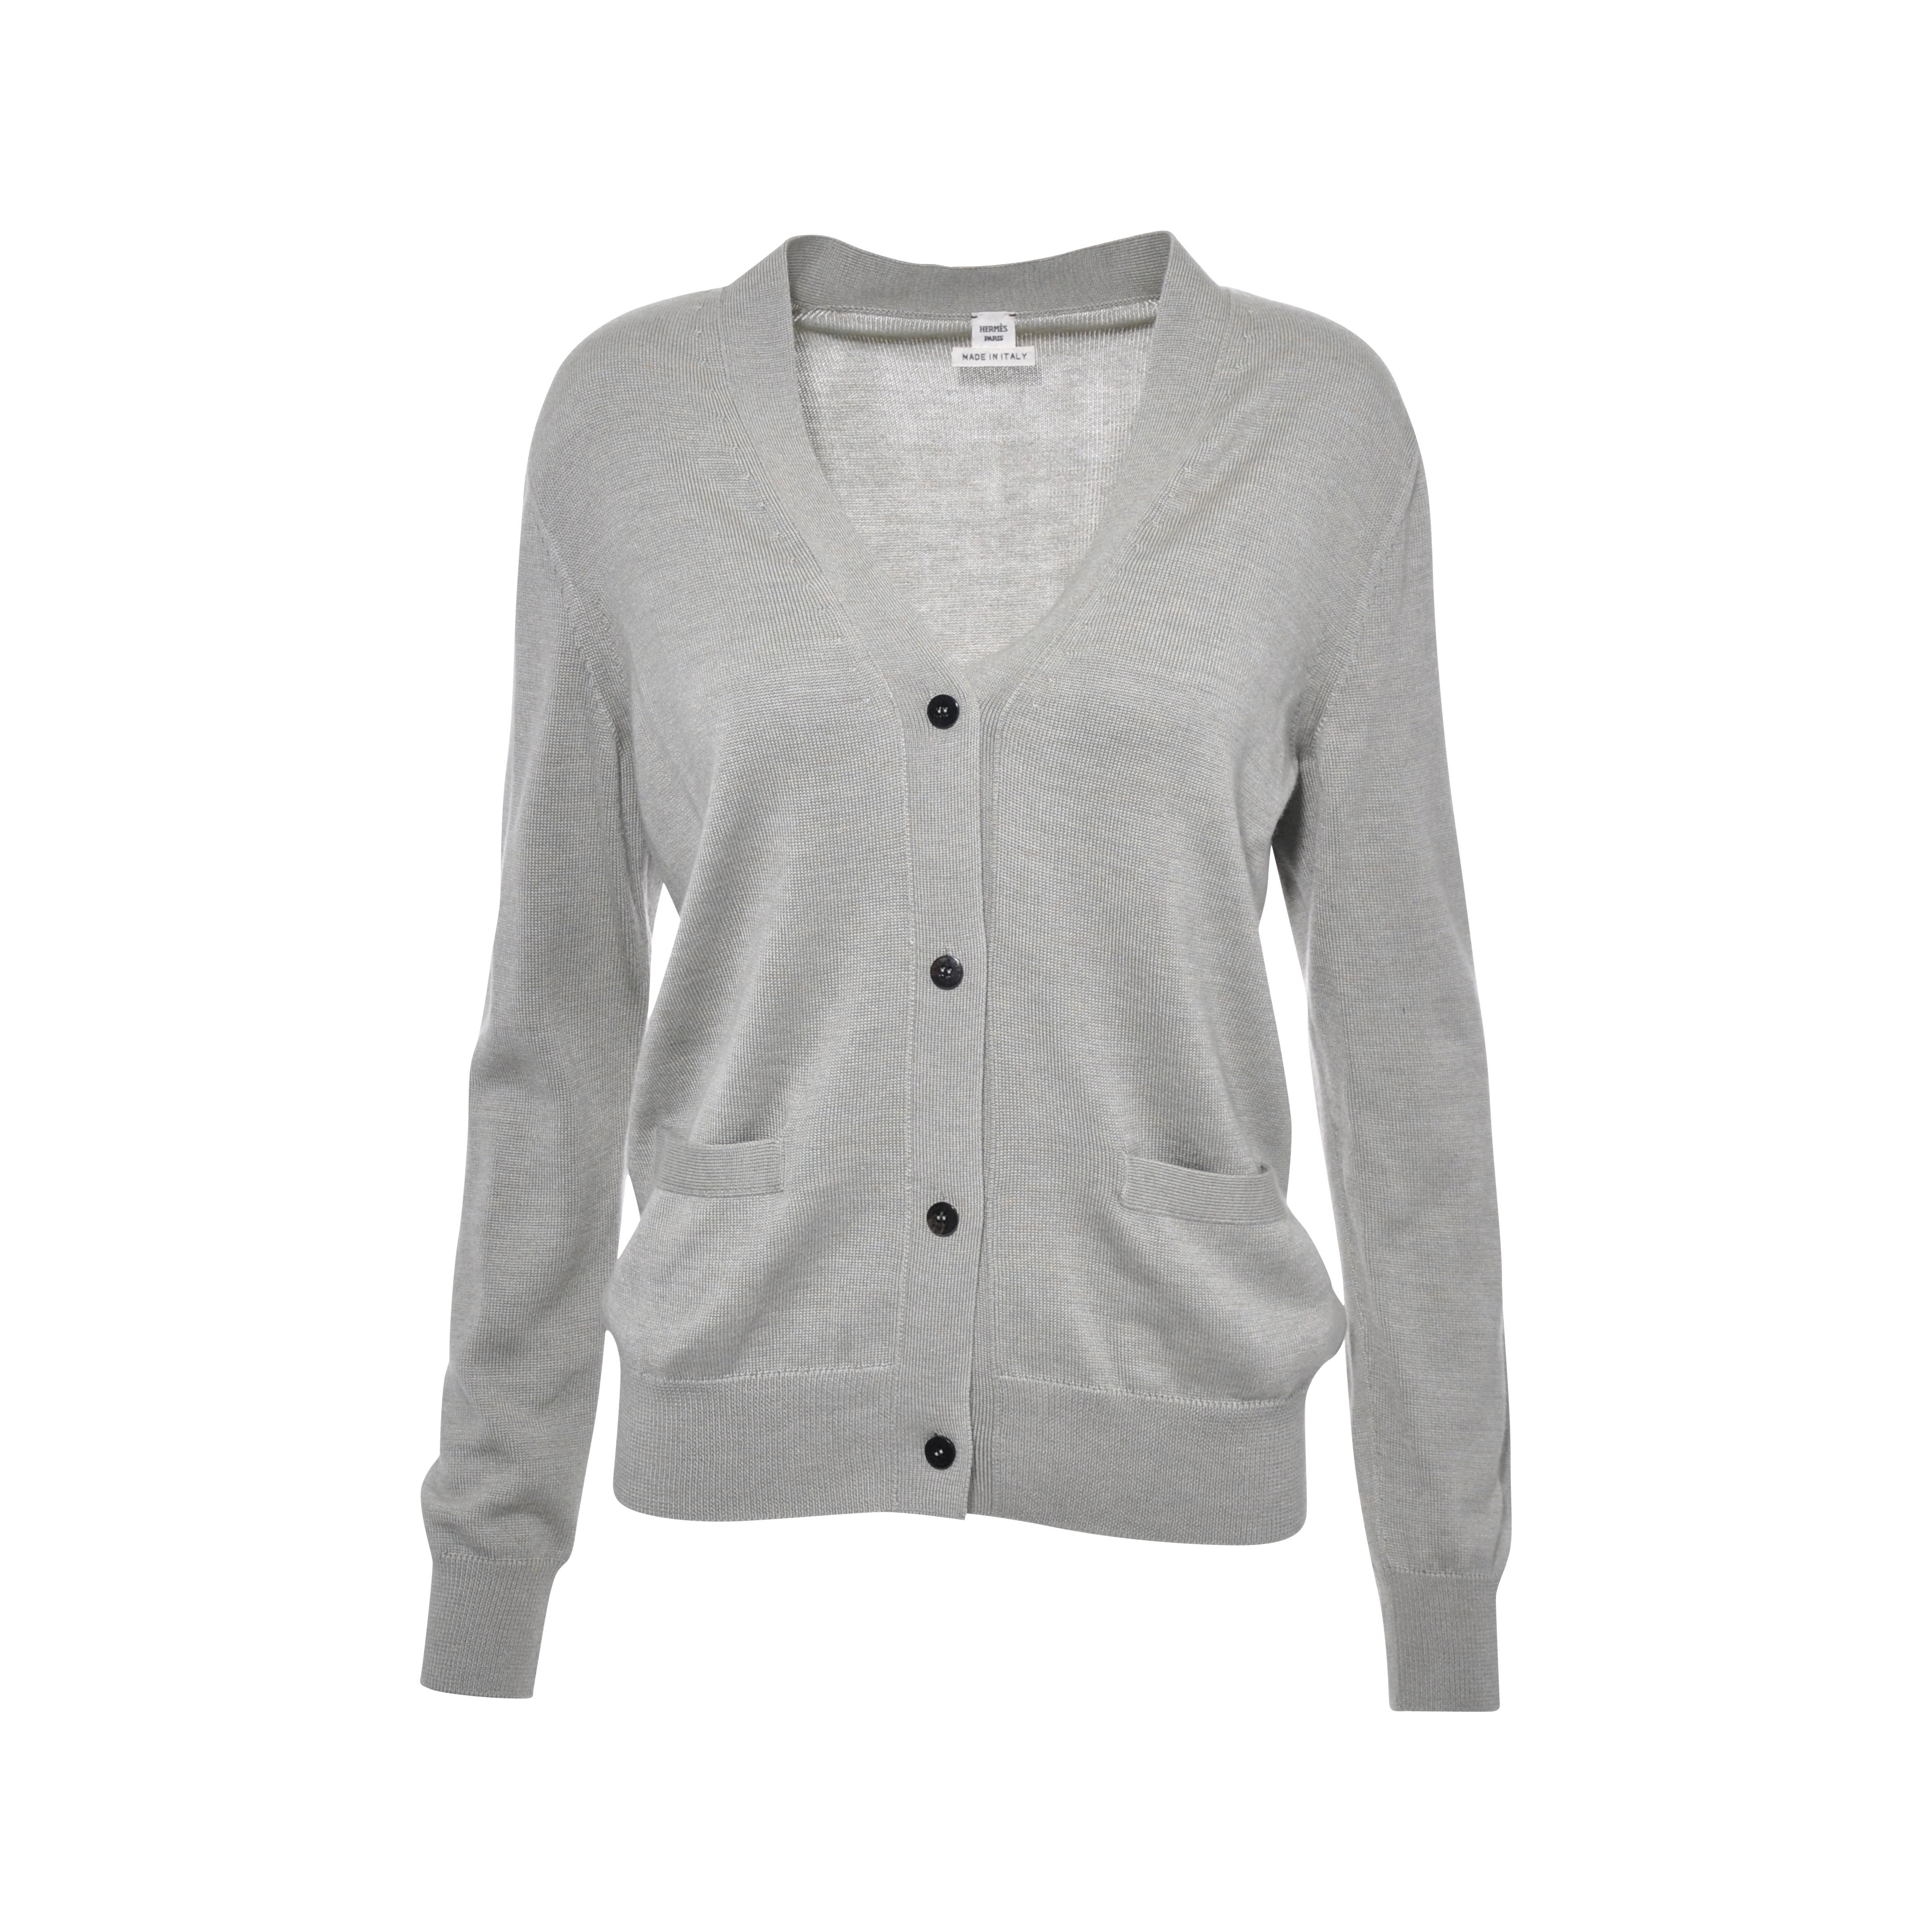 8ddac7ef55cdb8 Authentic Second Hand Hermès Button Down Cardigan (PSS-051-00111 ...